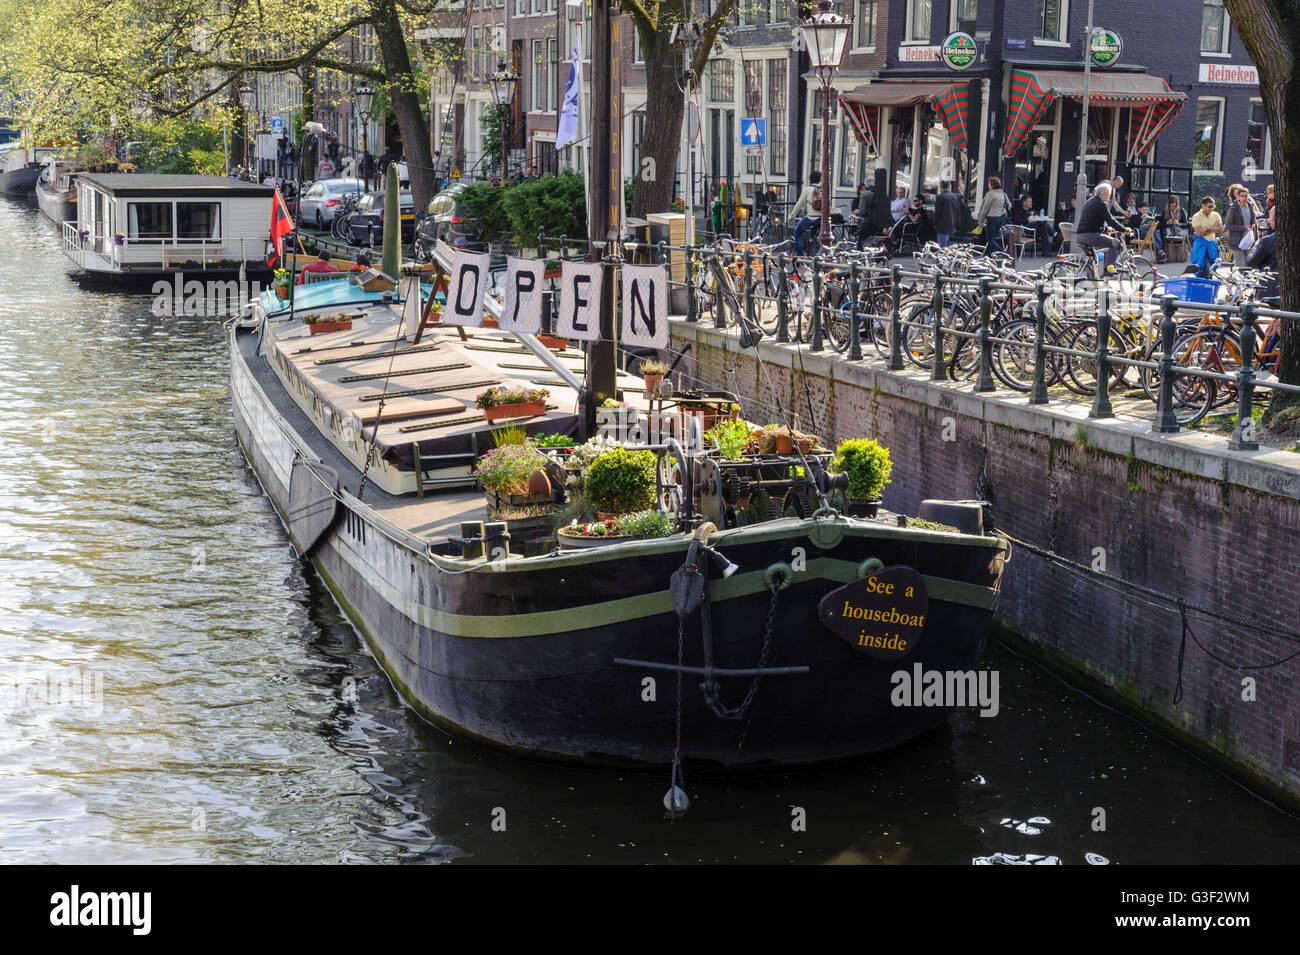 Houseboat museum, Prinsengracht, Amsterdam, Holland, Netherlands - Stock Image